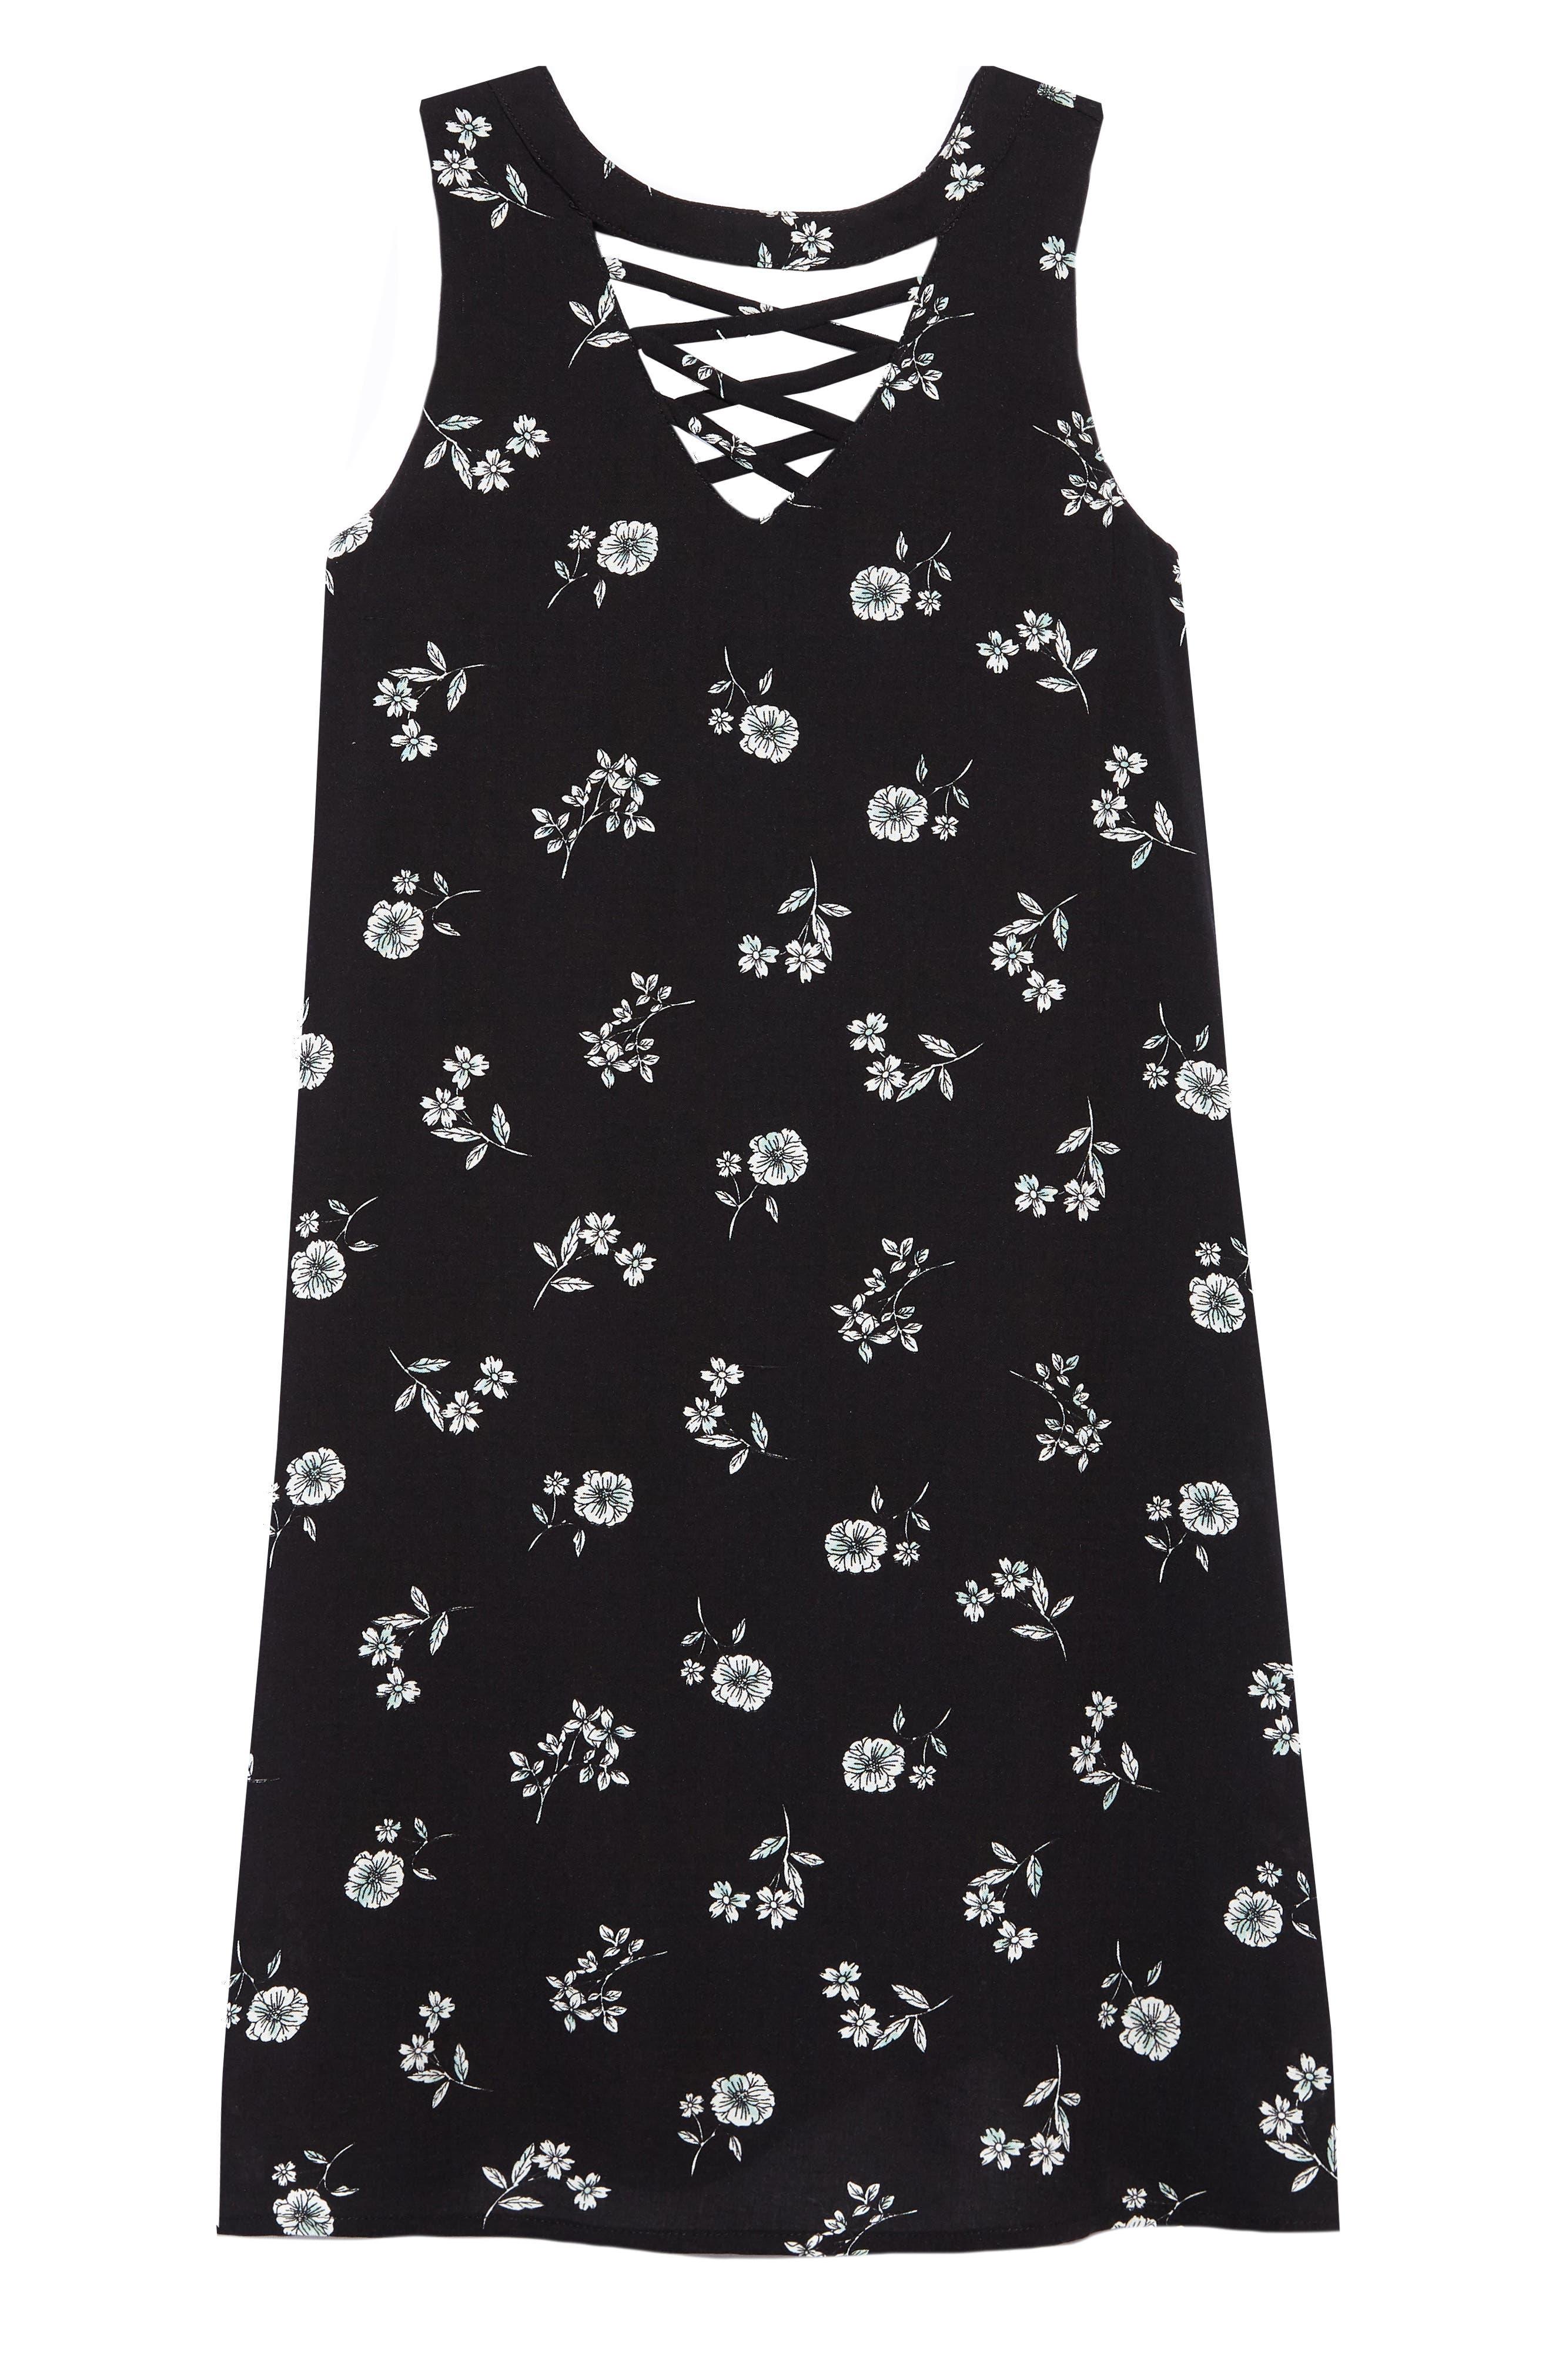 Floral Sleeveless Shift Dress,                         Main,                         color, Black Multi